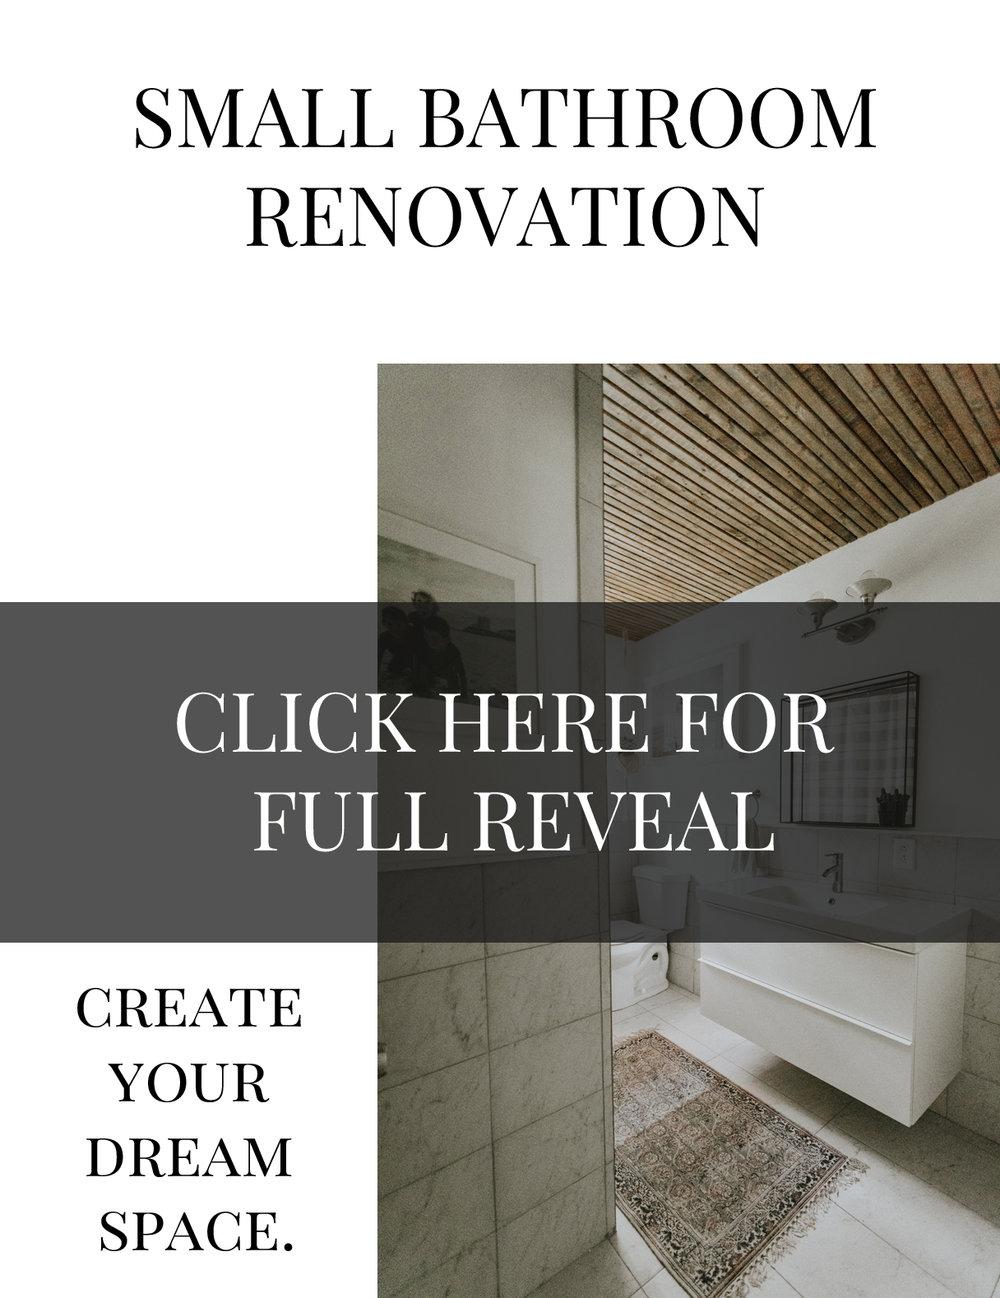 SMALL BATHROOM RENOVATION www.thisminimalhouse.com